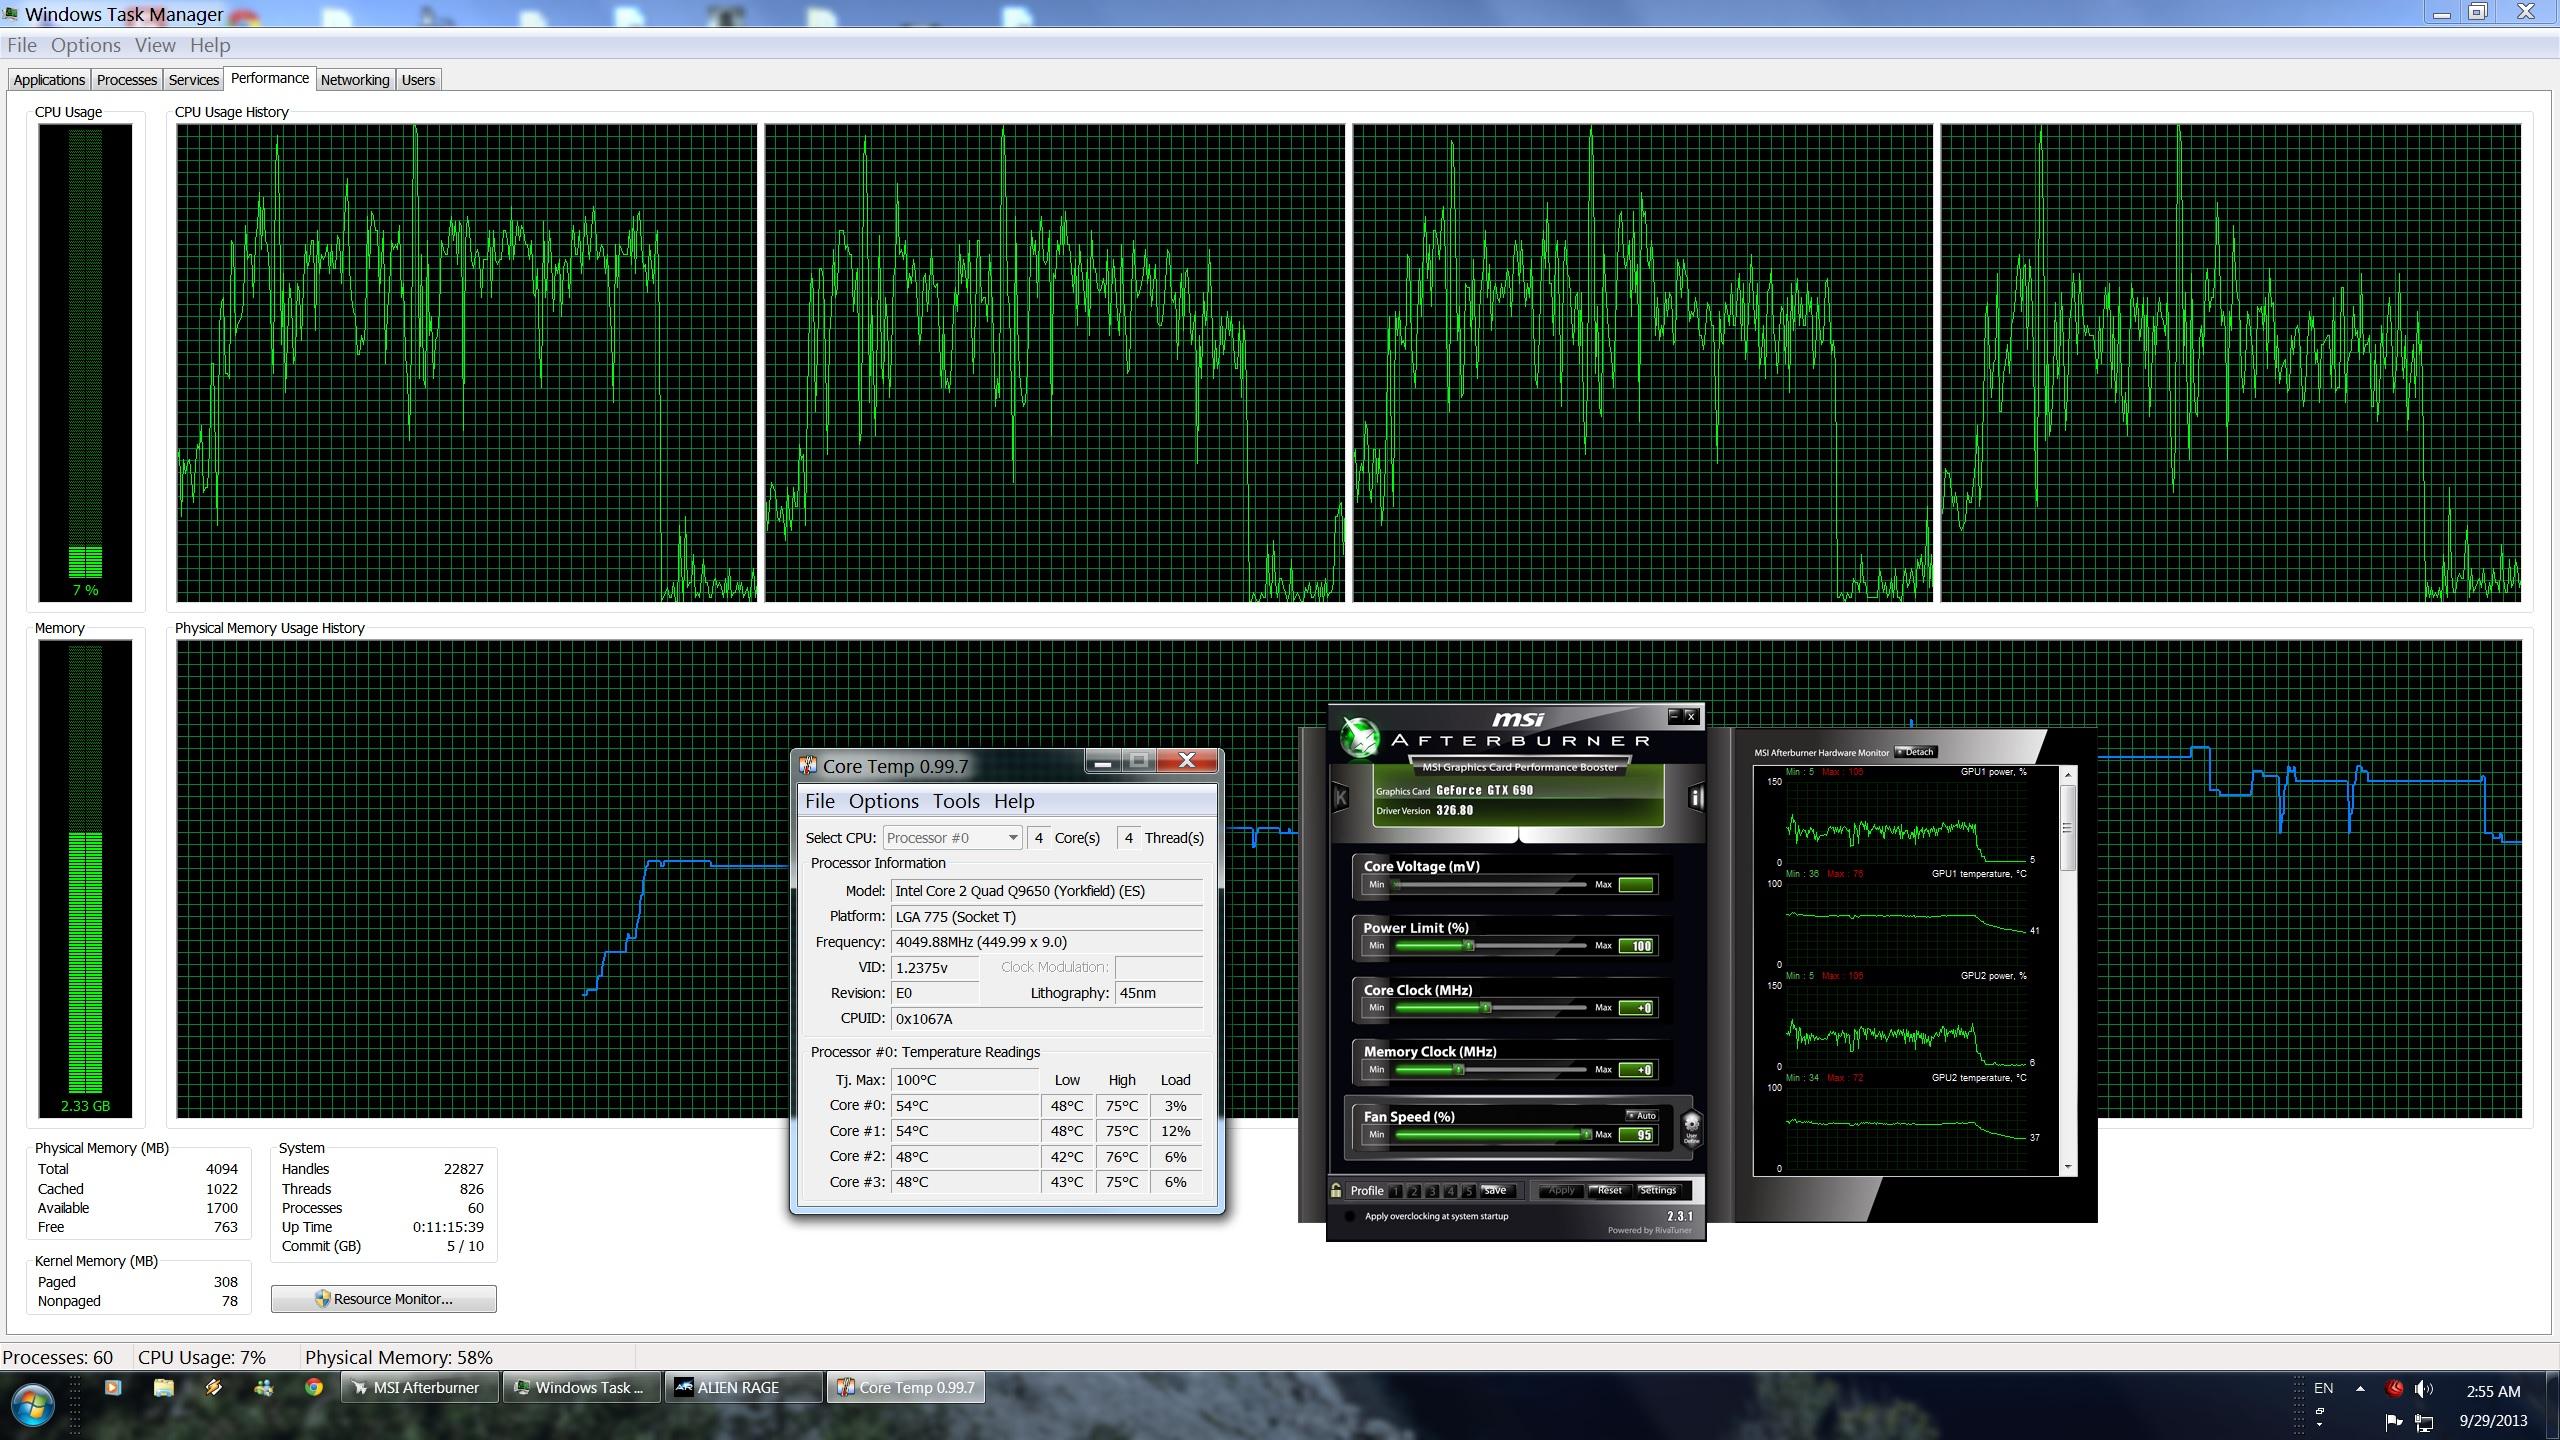 Alien Rage Unlimited PC Performance